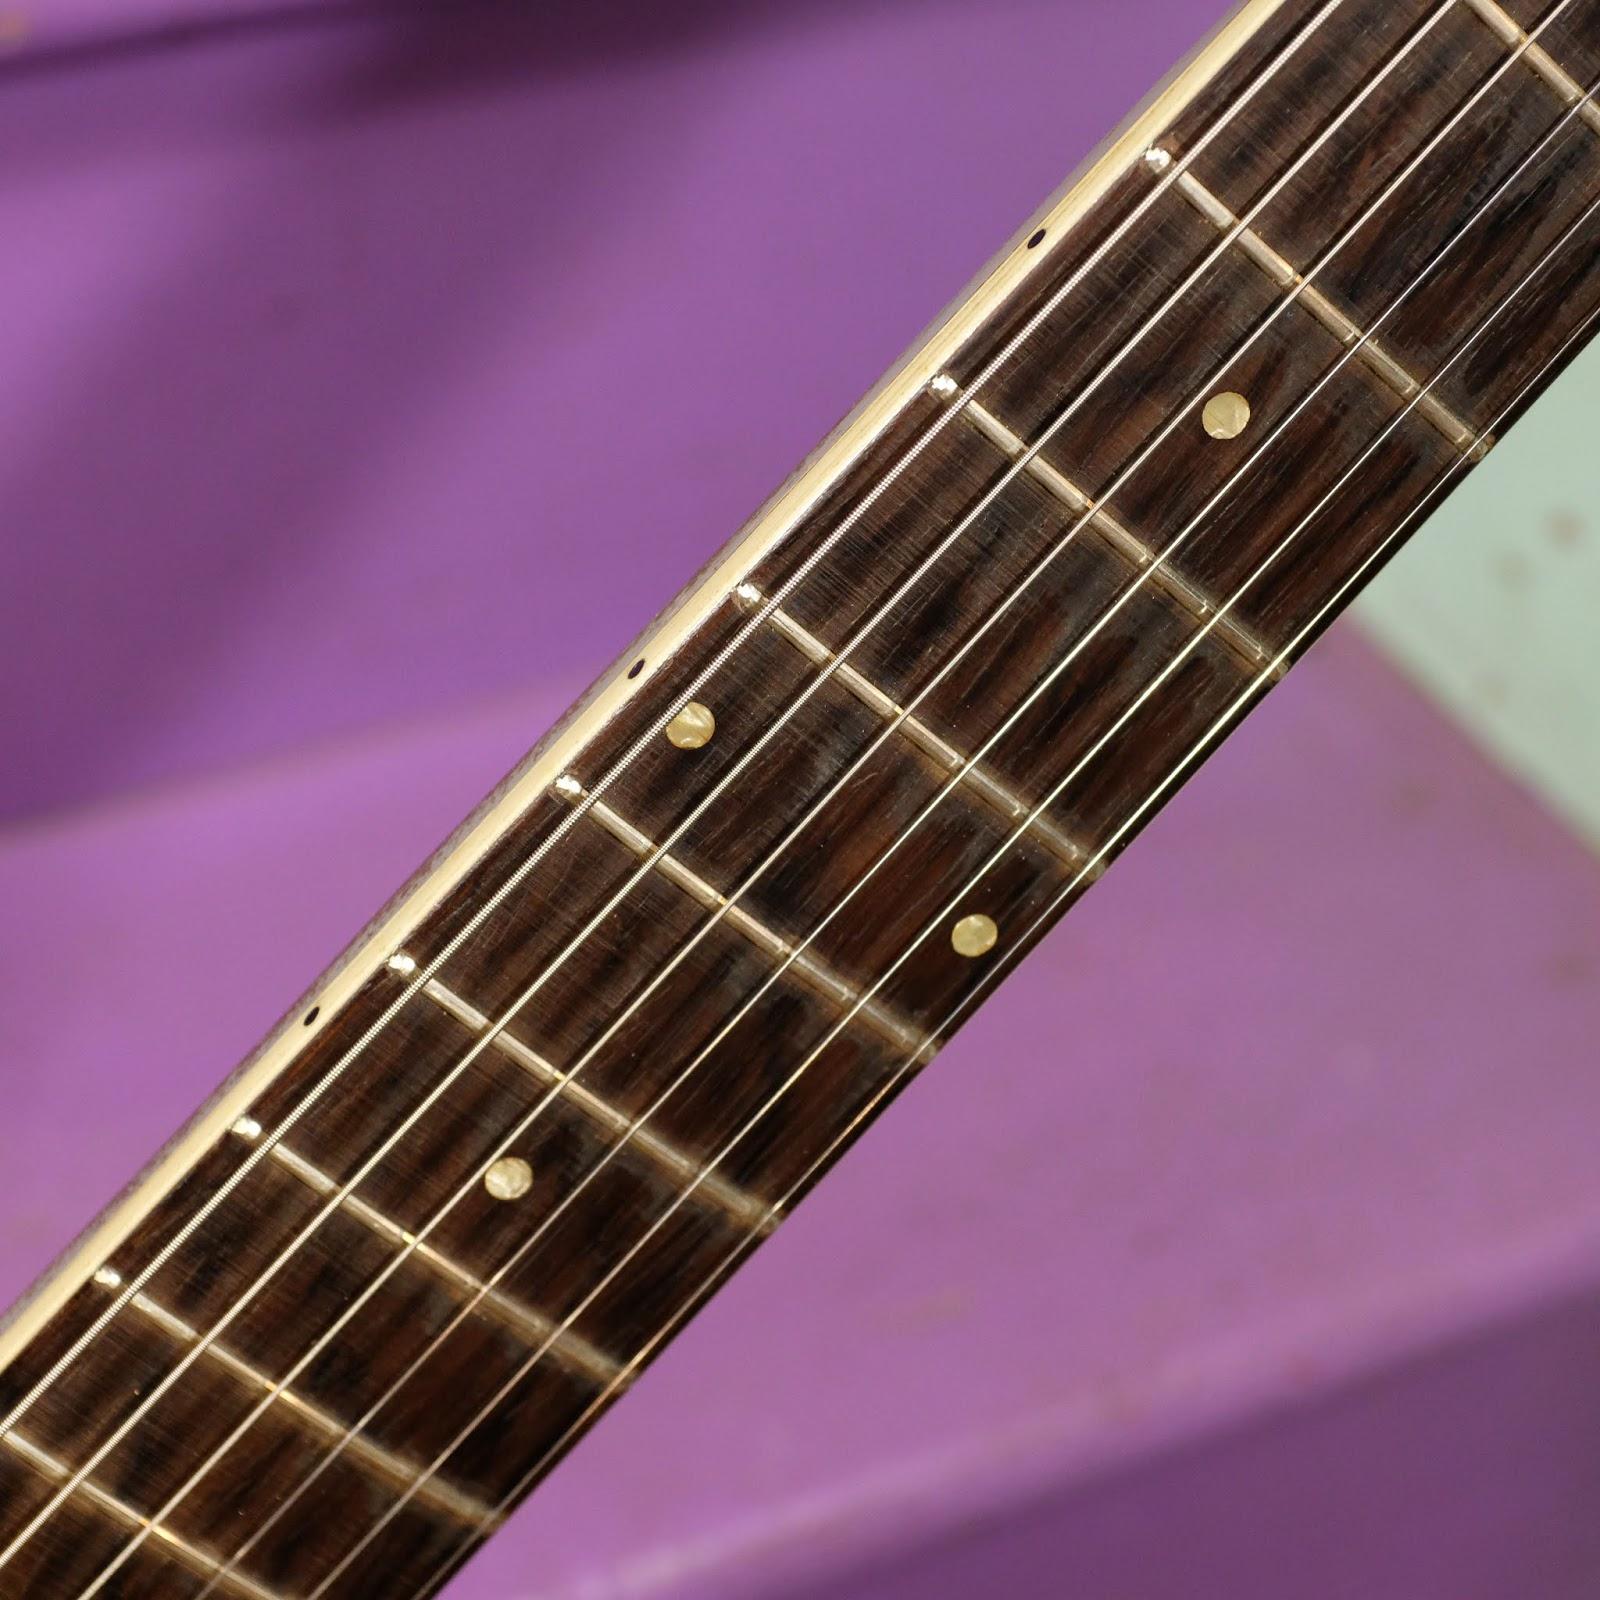 hight resolution of wiring diagram on harmony h78 harmony guitars 1950s harmony h44 stratotone electric guitar on harmony h78 harmony guitars harmony insurance